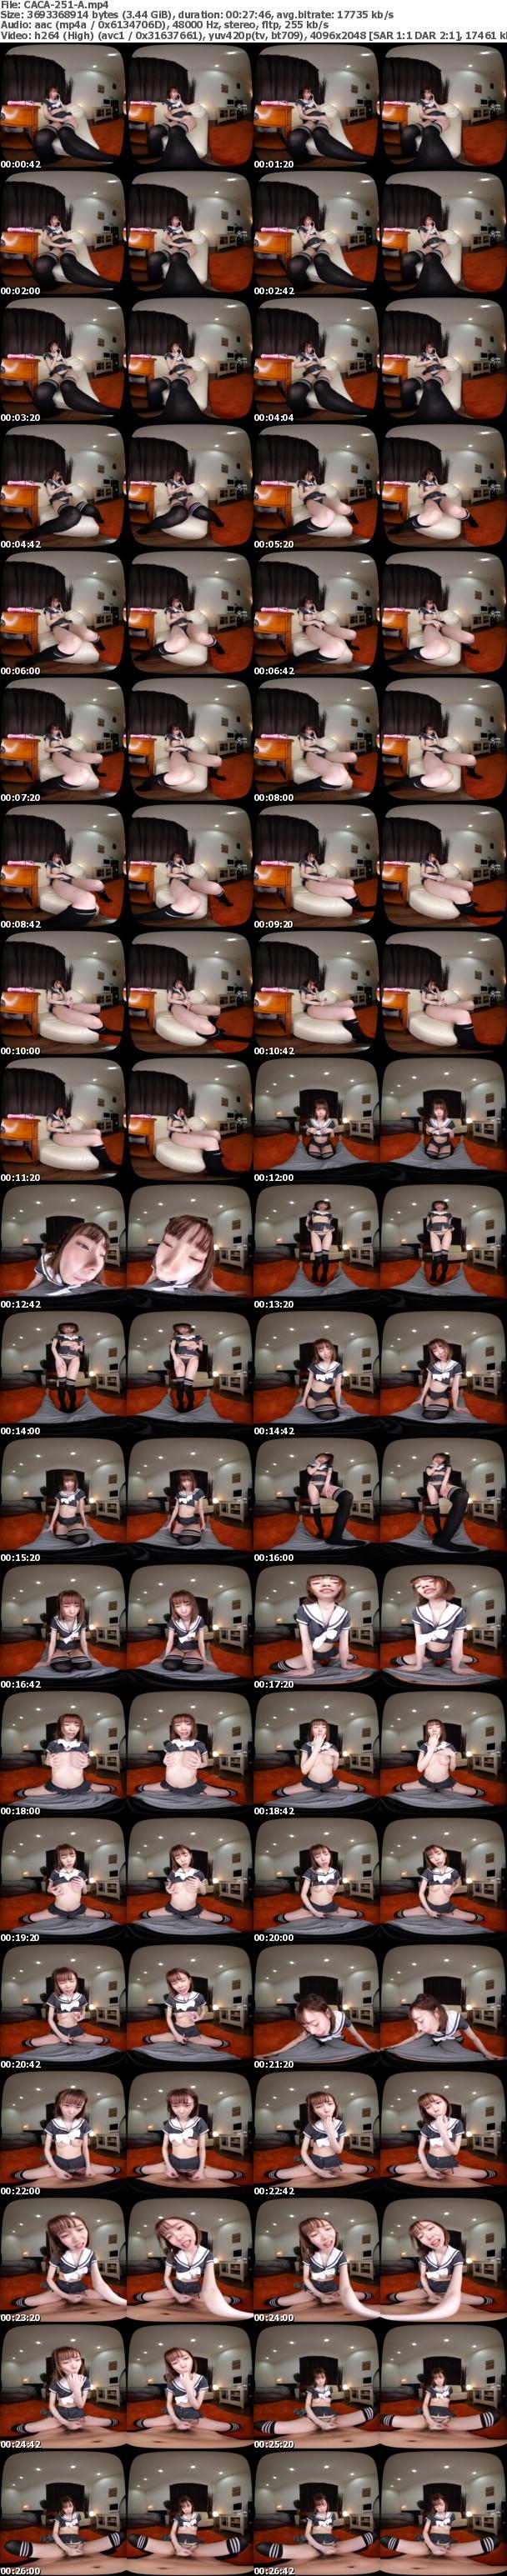 (VR) CACA-251 神聖不可侵絶対領域倶楽部~#ニーハイ #太もも #制服 #高梨有紗~